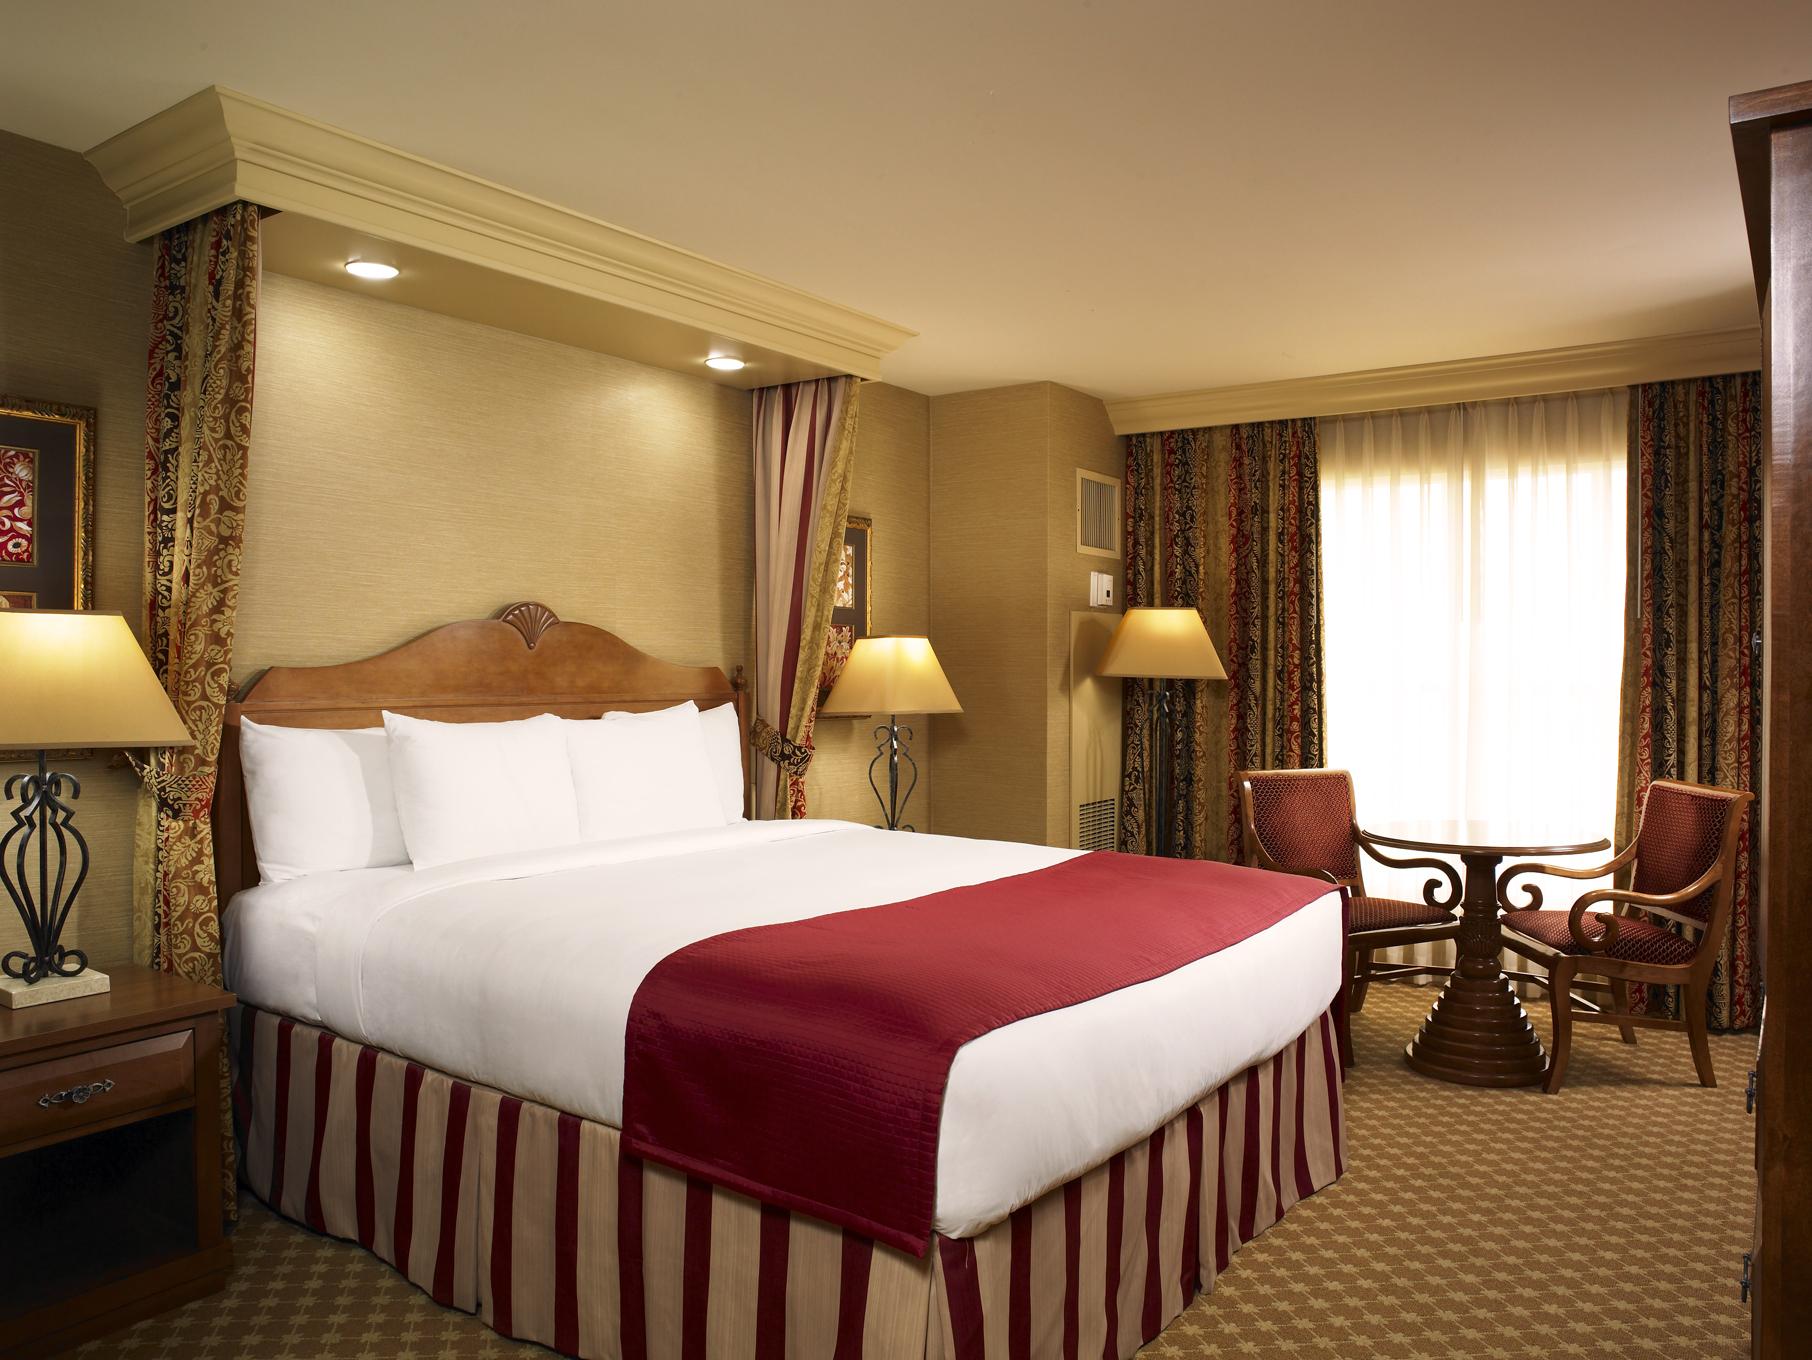 Sunset hotel and casino golden eagle casino horton ks